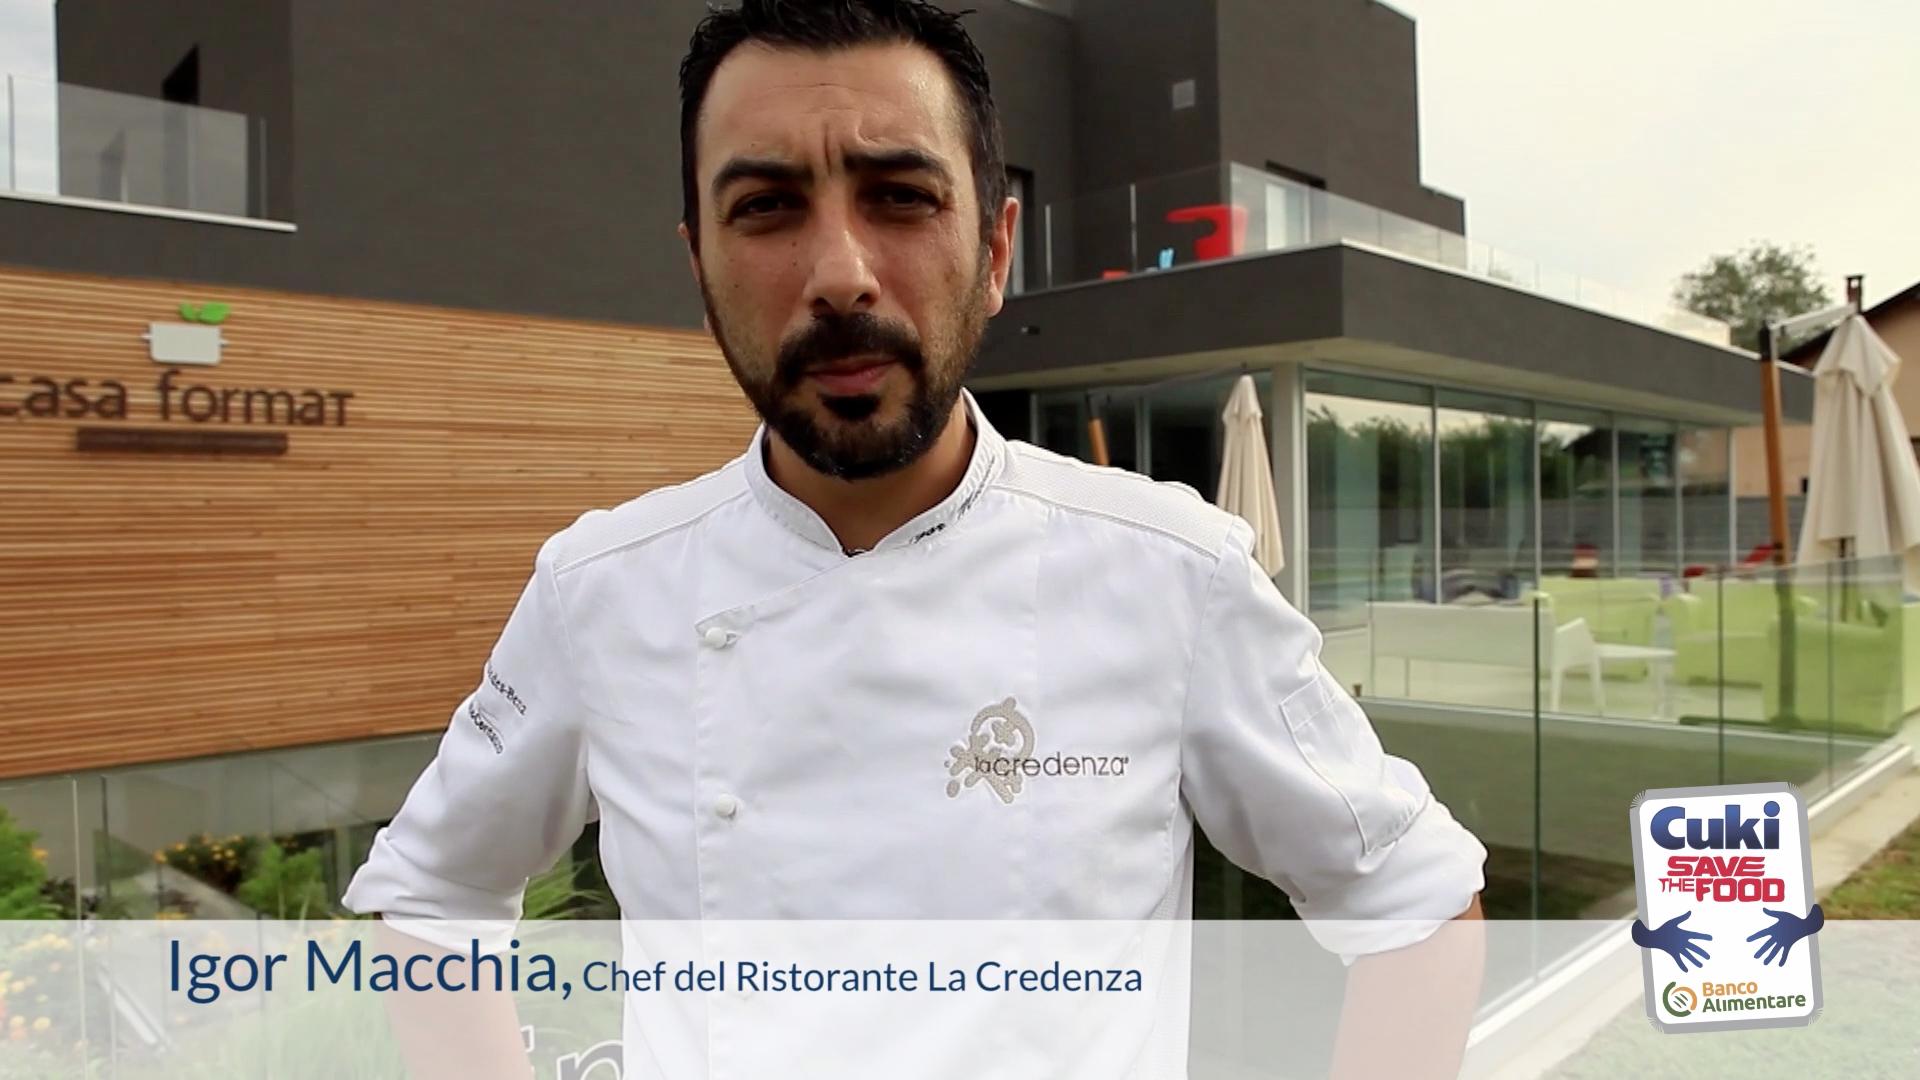 La Credenza Igor Macchia : Igor macchia cuki save the food